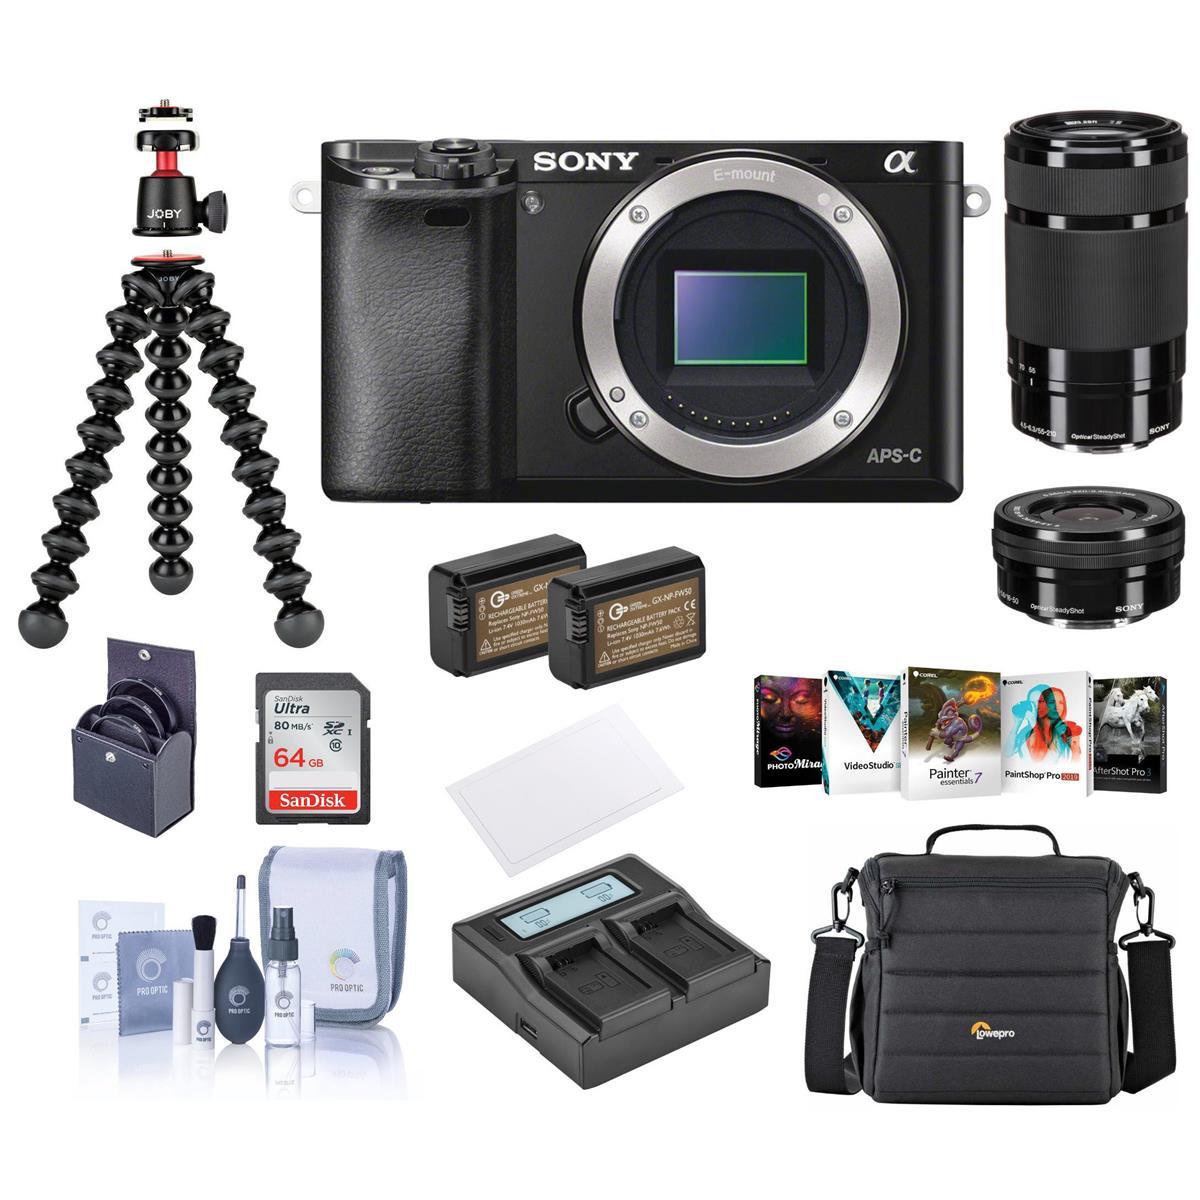 Sony Alpha A6000 Mirrorless Camera (Black) Bundle: 16-50mm & 55-210mm OSS Lenses, Joby Pod 3K, 64GB SDXC Card, 2 Batteries, Camera Bag & More - $598.00 + FS